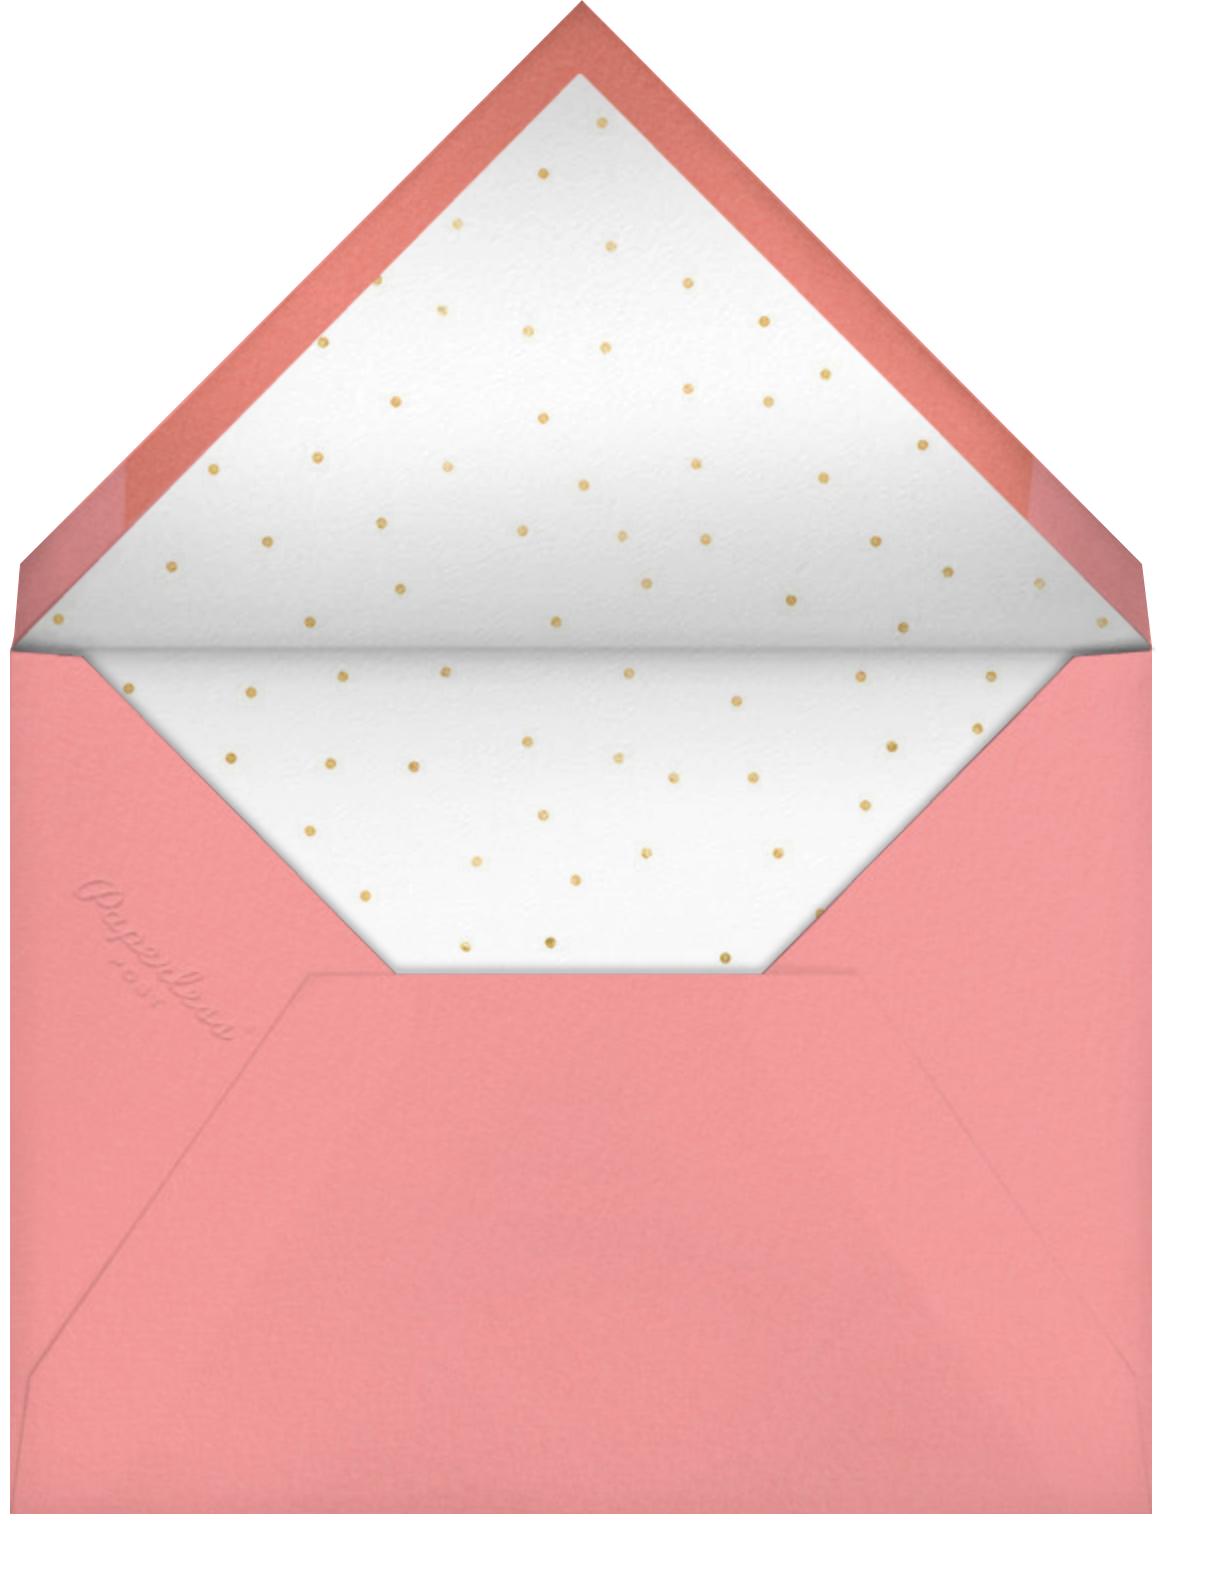 Sweet Tea - Paperless Post - Brunch - envelope back